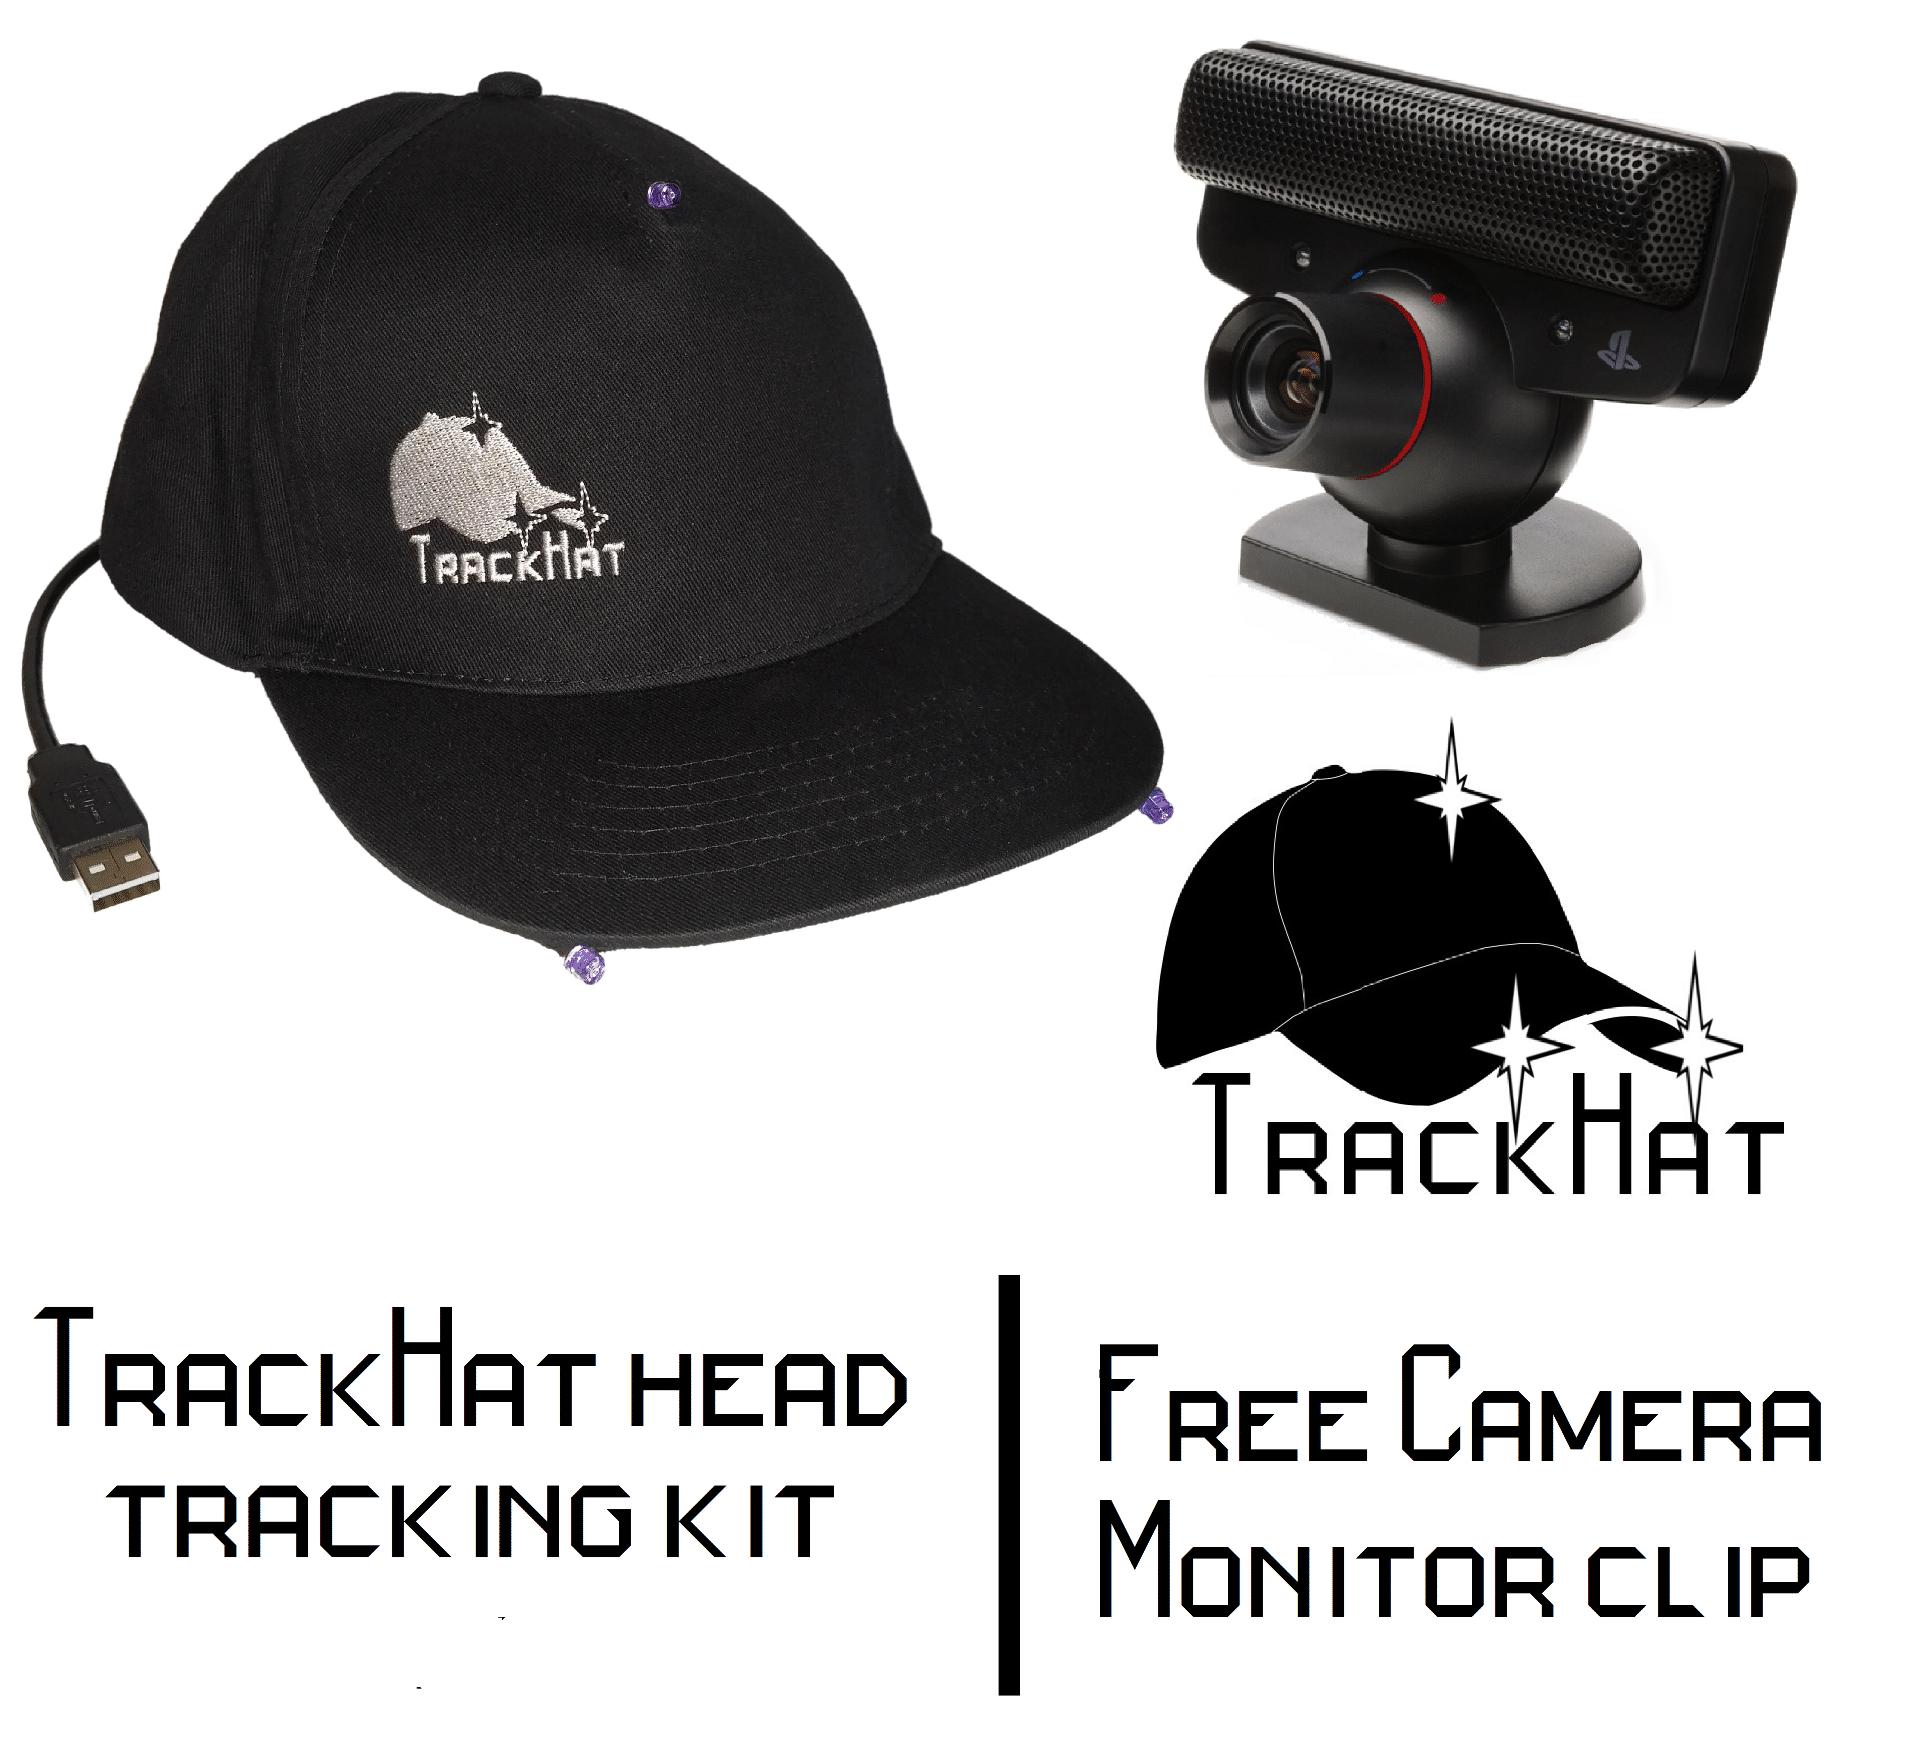 TrackHat Tracking Kit